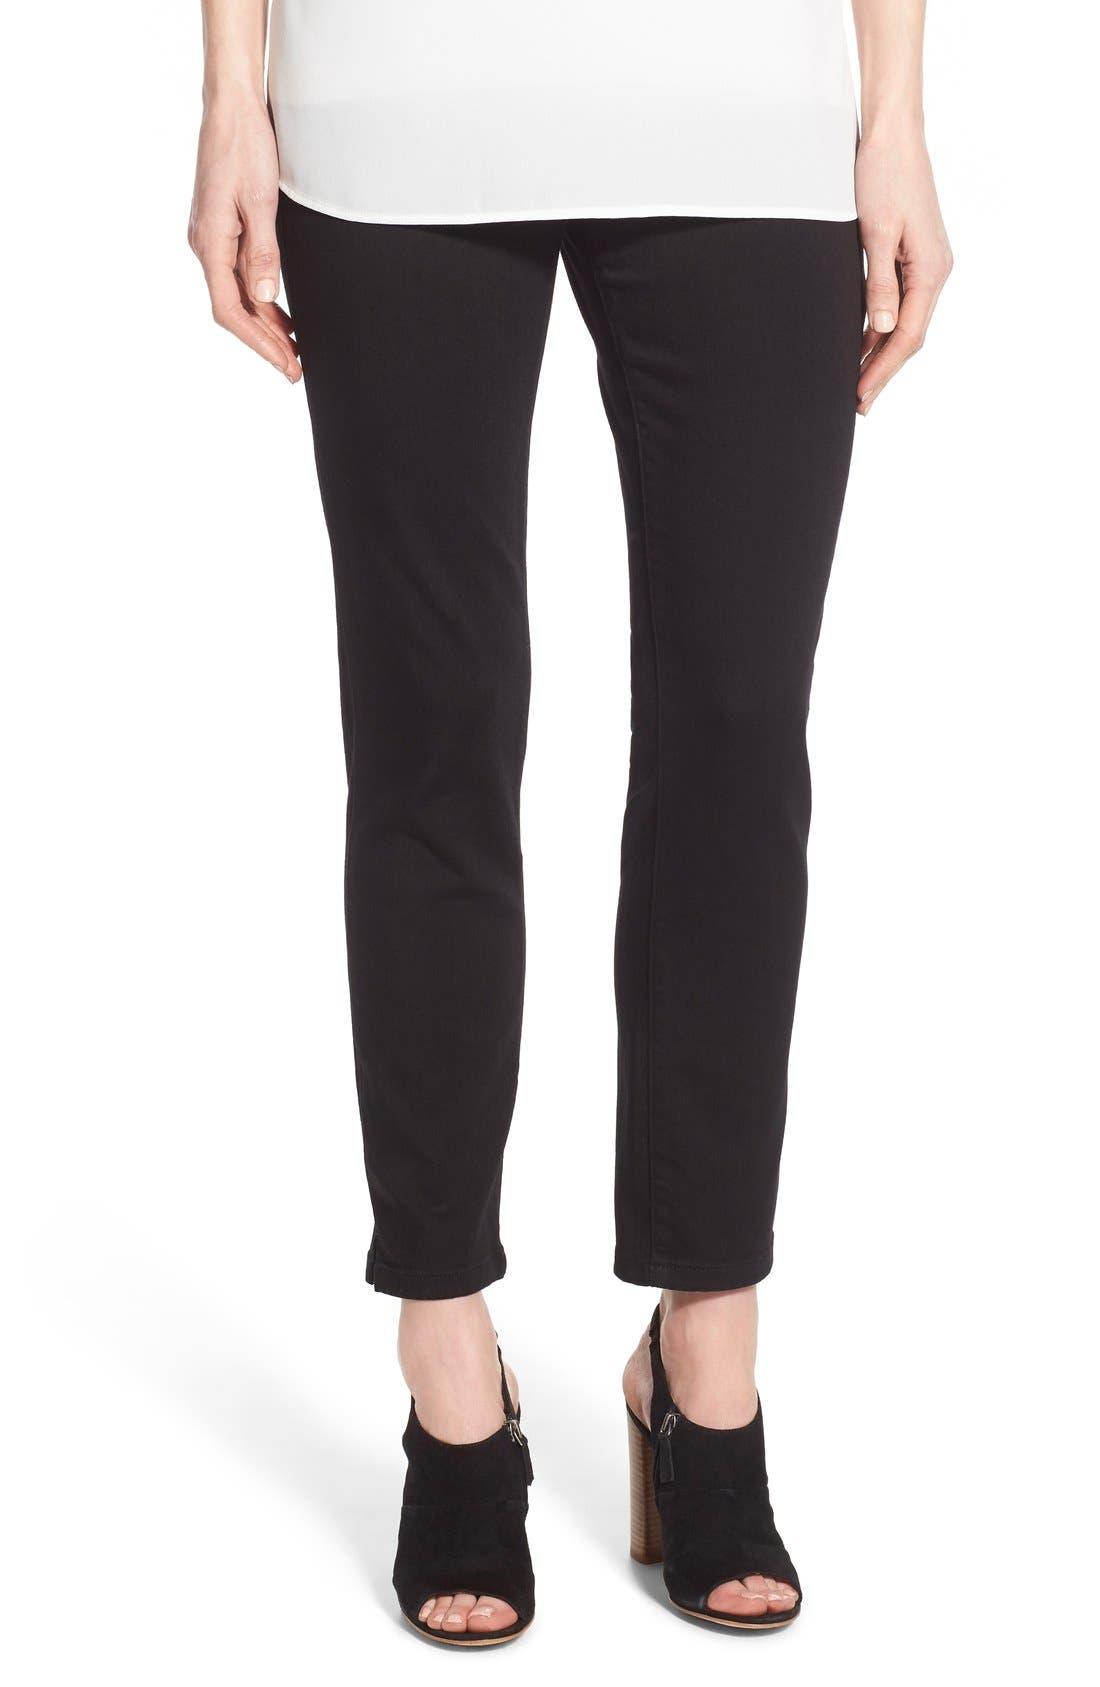 Main Image - NYDJ Millie Pull-On Stretch Ankle Skinny Jeans (Regular & Petite)